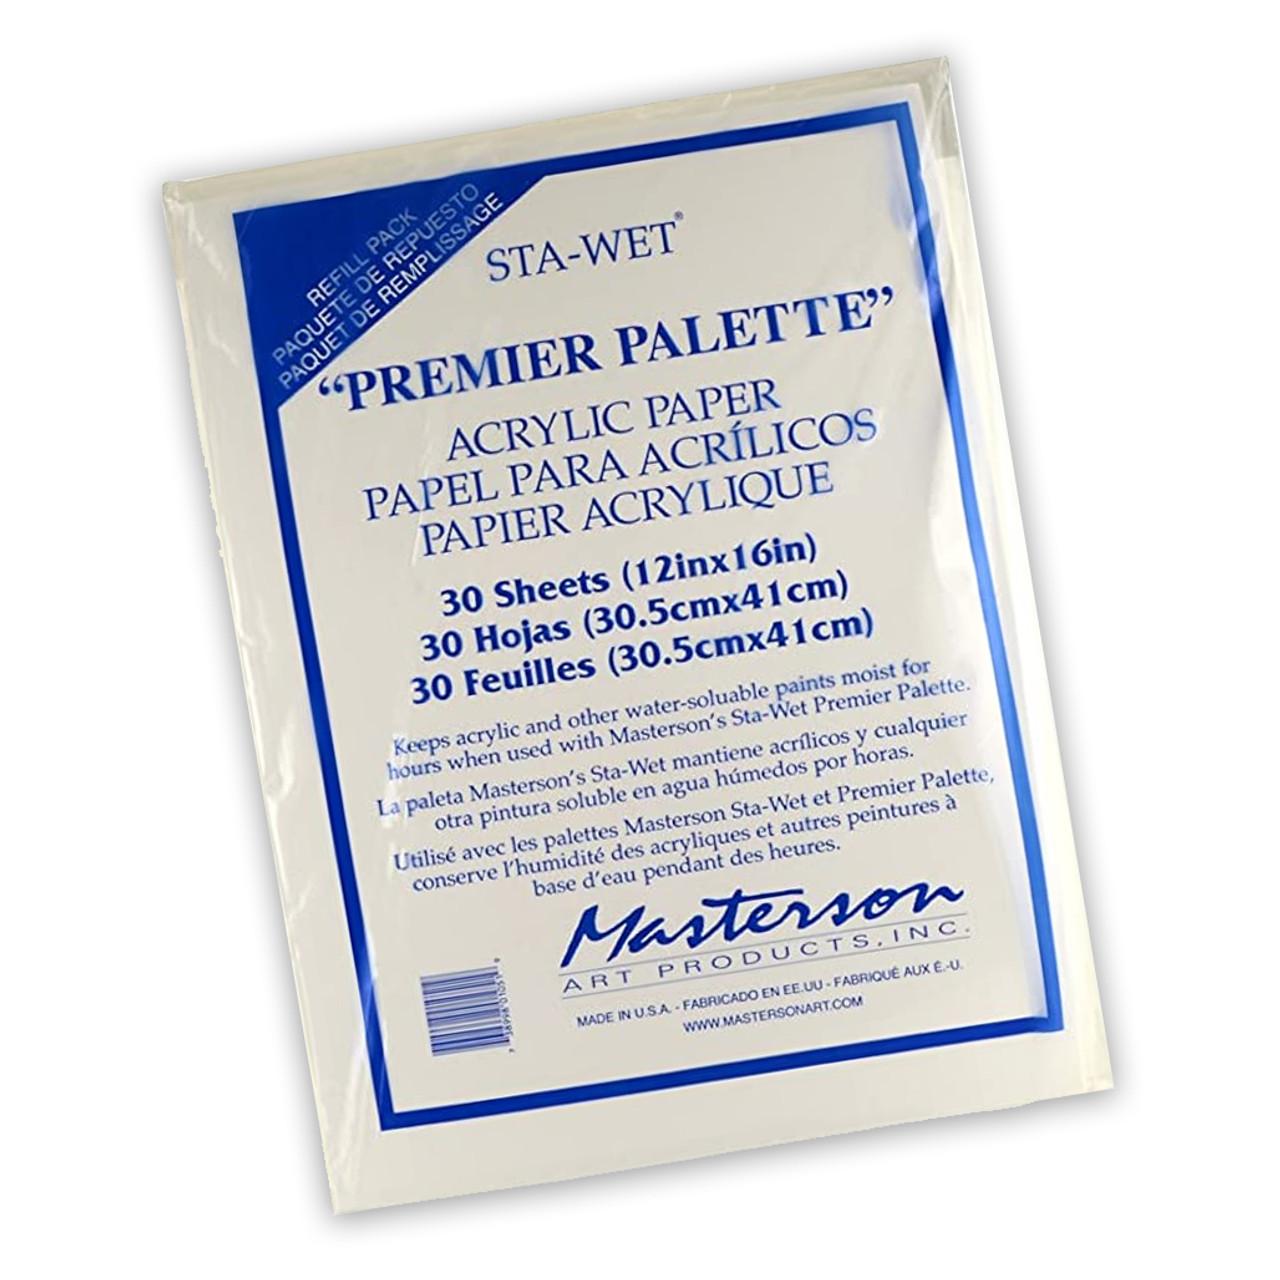 Sta-Wet Palette Acrylic Paper Refills